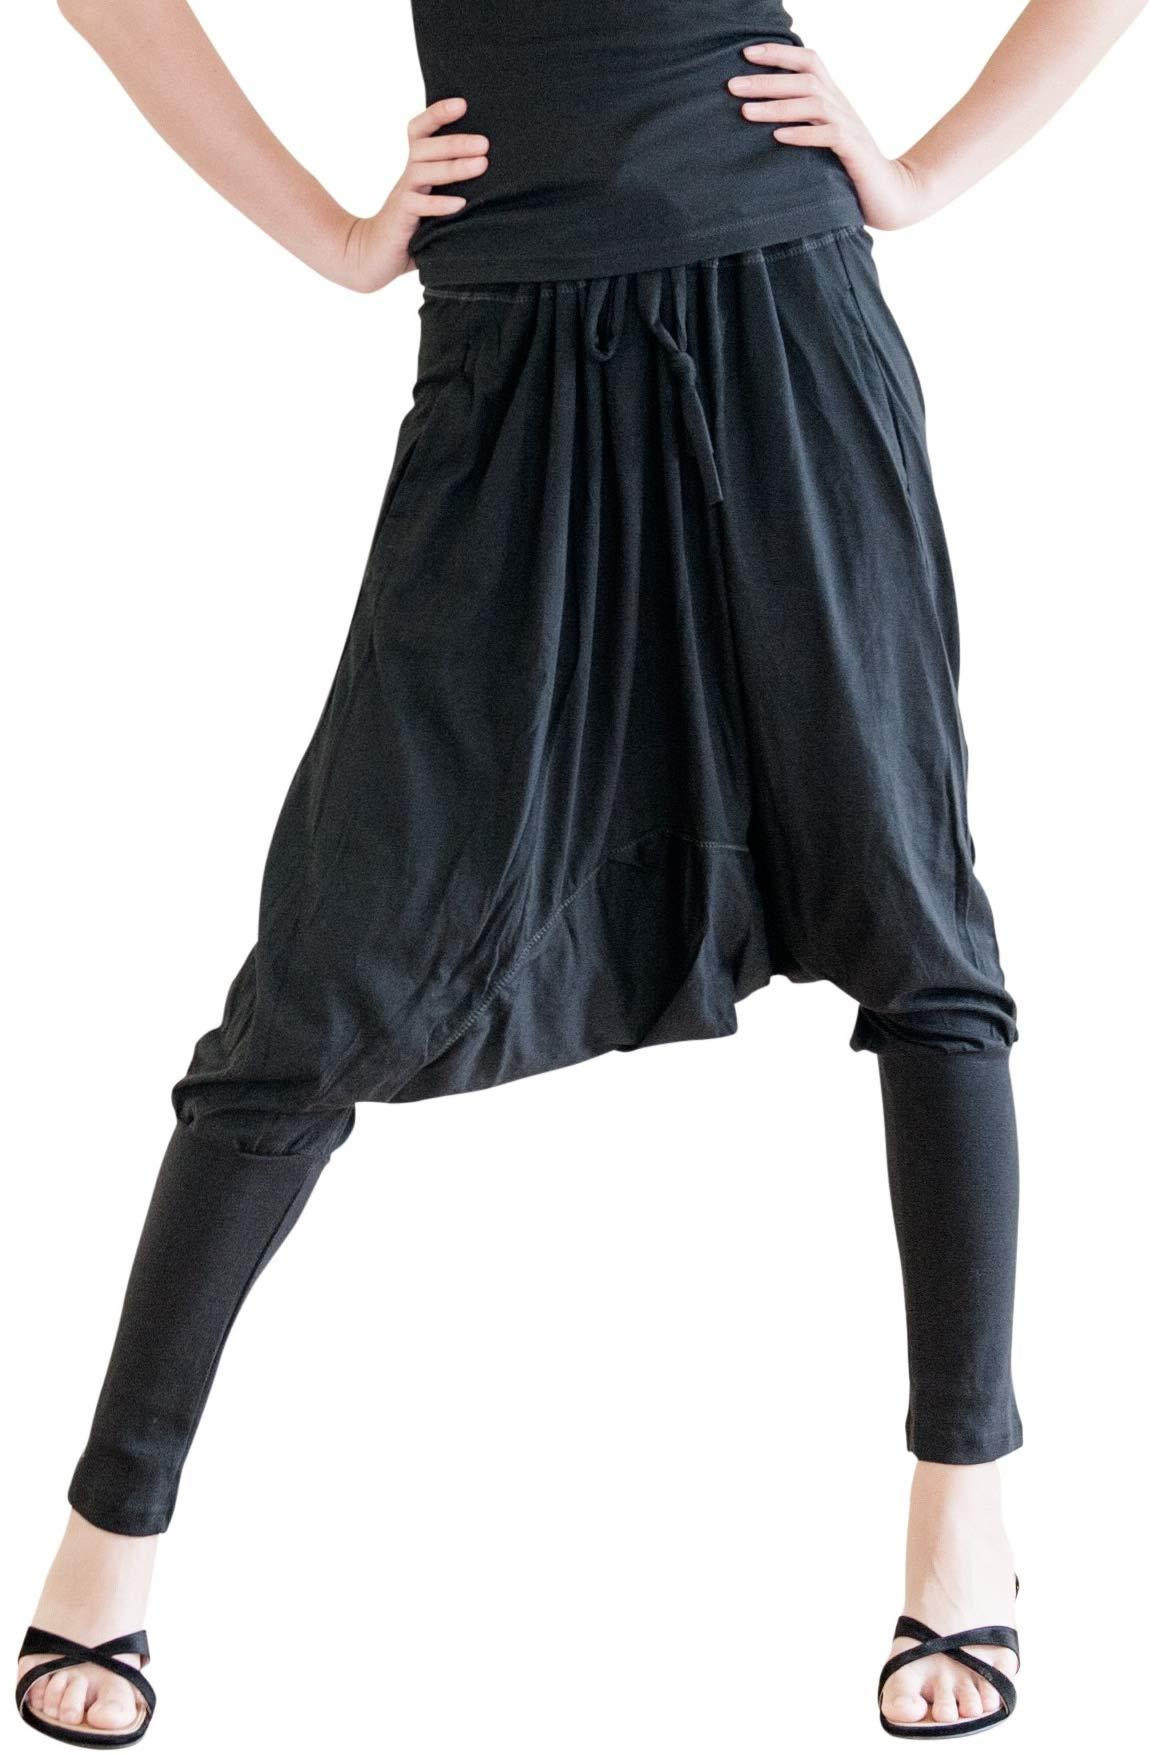 BohoHill Baggy Harem Pants Cotton Jersey Tapered Leg Unisex Trousers Black